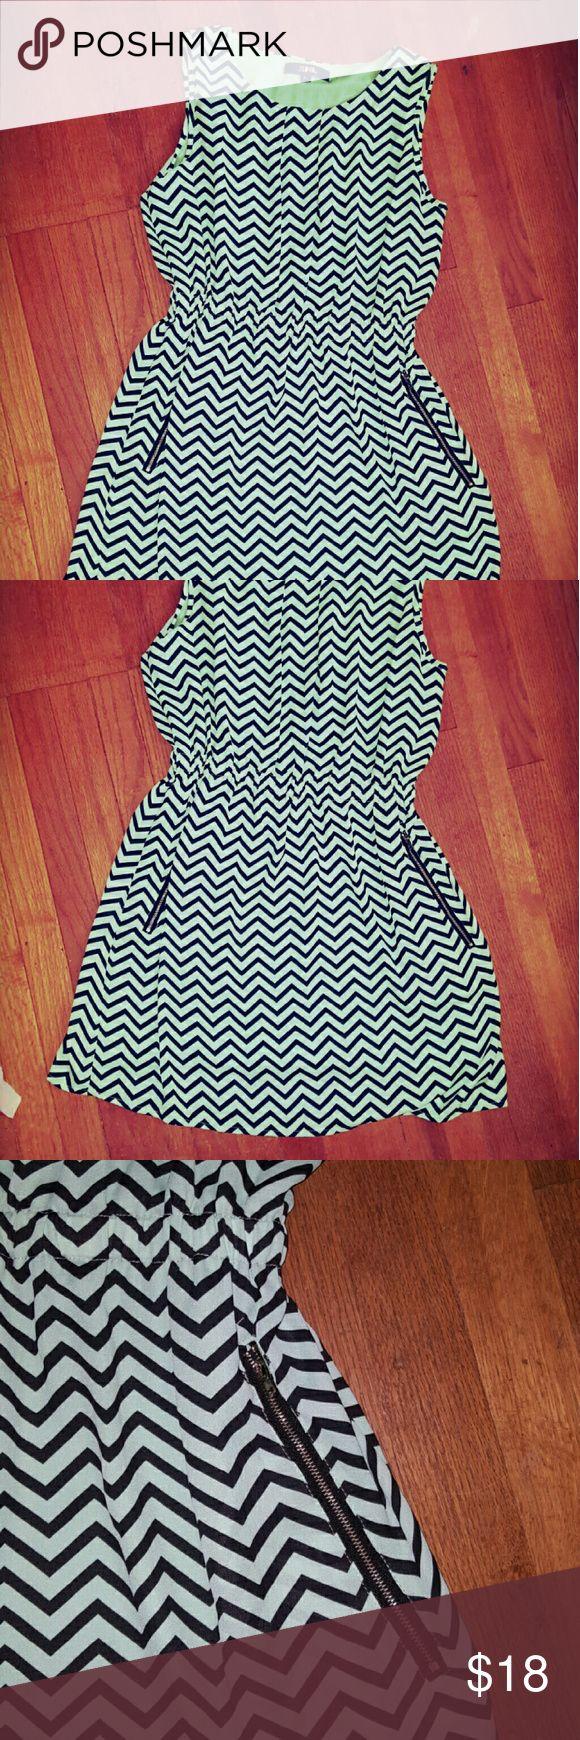 Best 25+ Mint chevron dresses ideas on Pinterest | Chevron dress ...